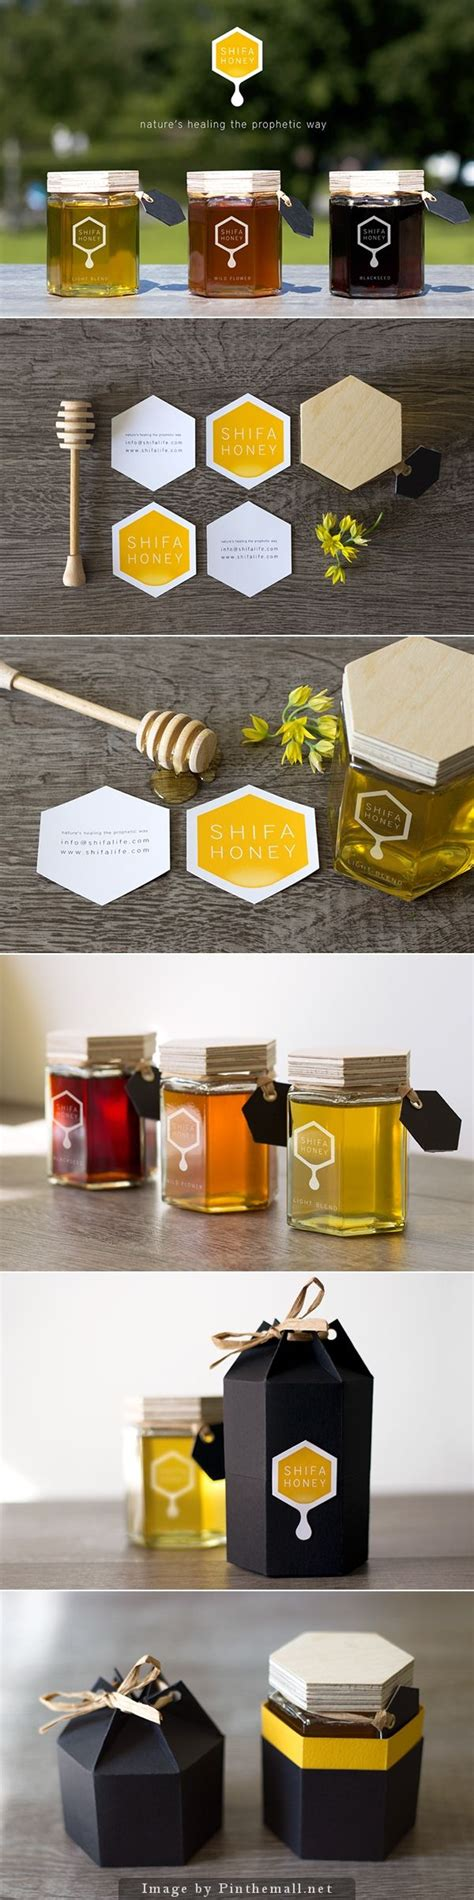 Shifa Set 25 best ideas about honey label on honey jars